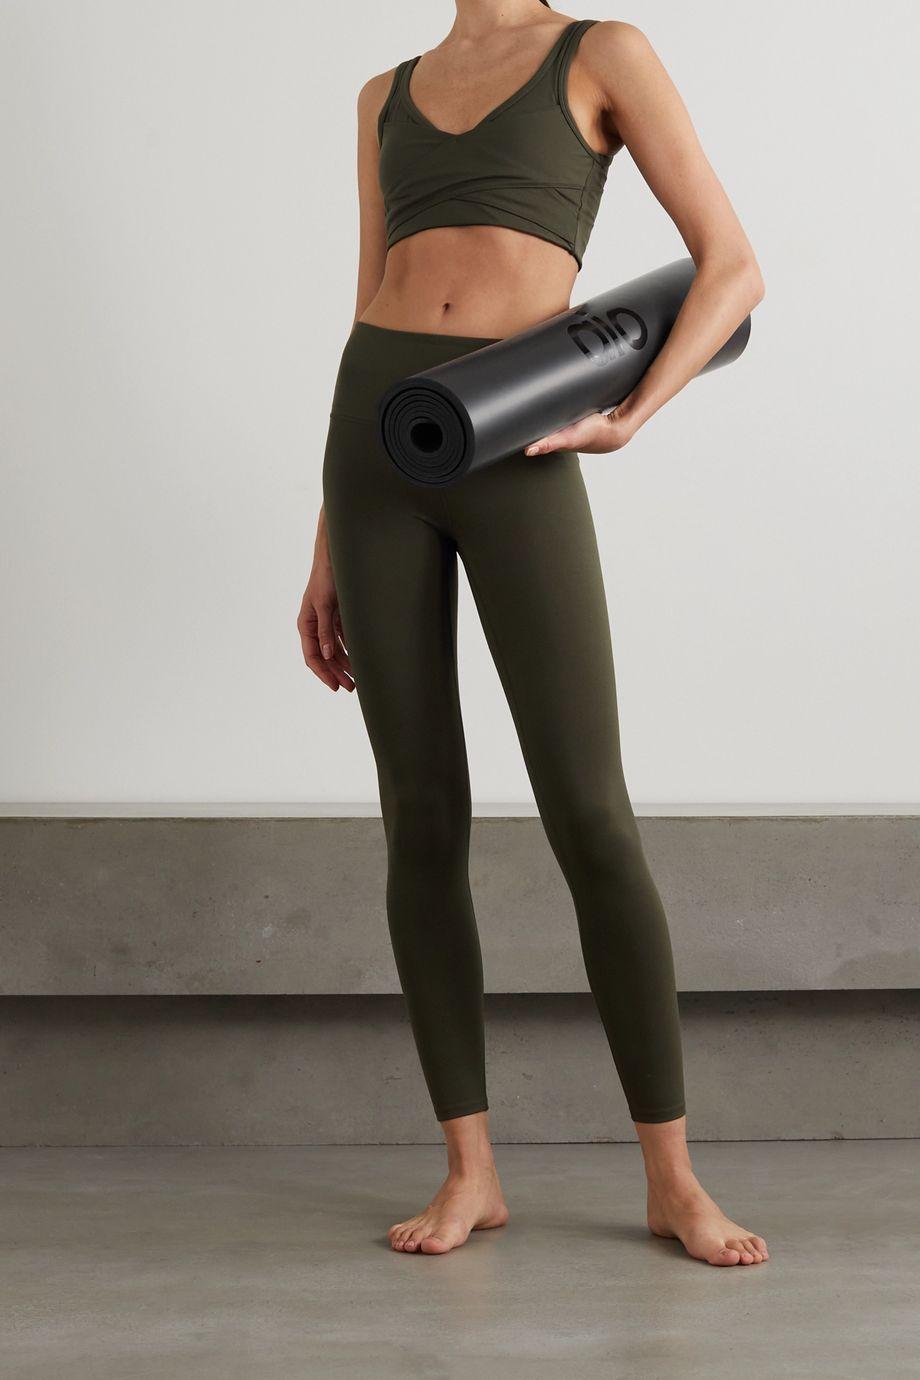 Alo Yoga Alo Warrior yoga mat